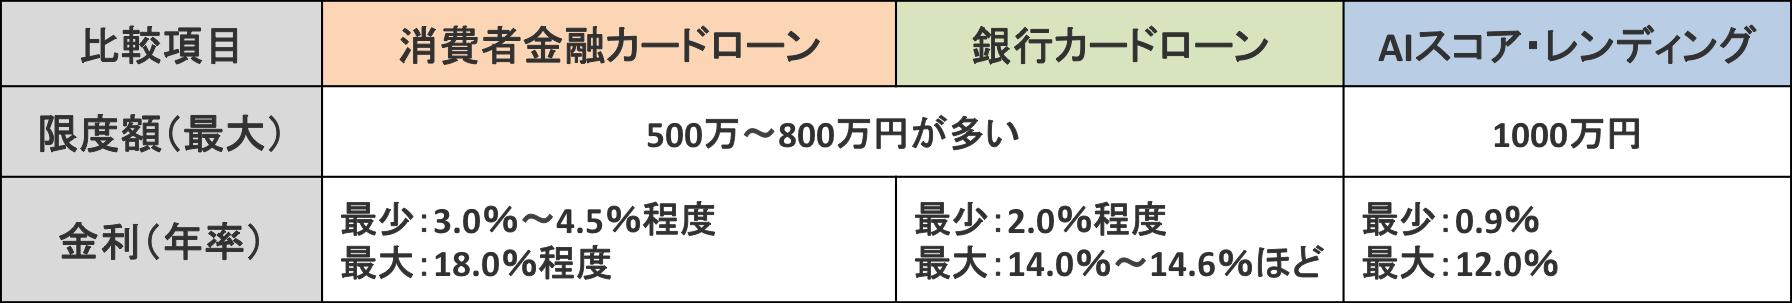 J.Score メリット デメリット4